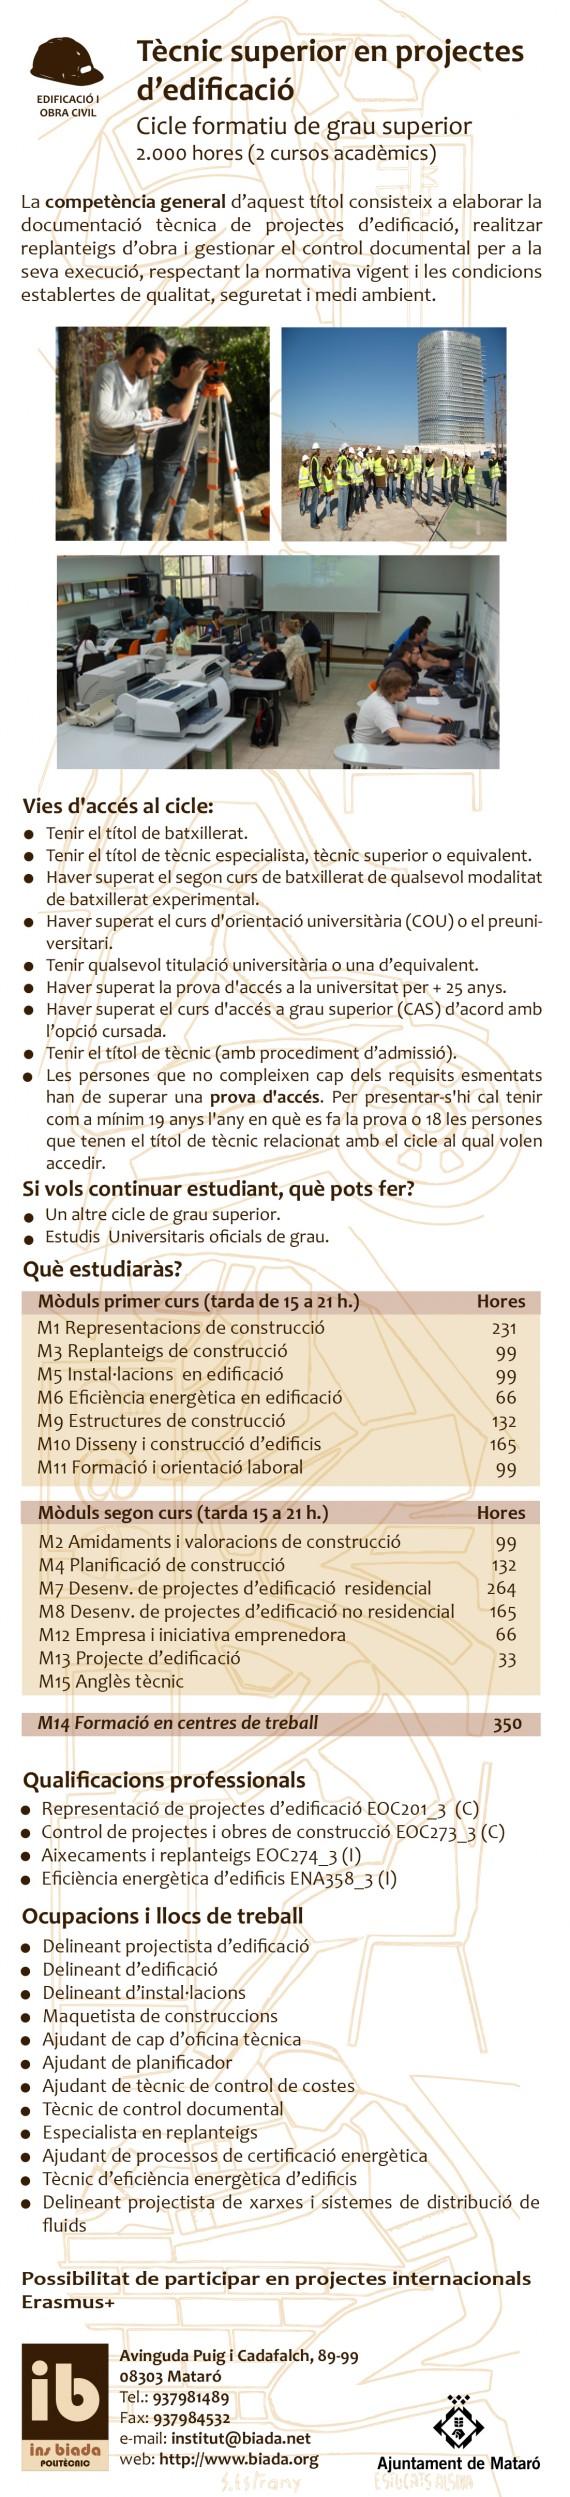 CSPE_fulleto_projectes_edificacio_individual_2016